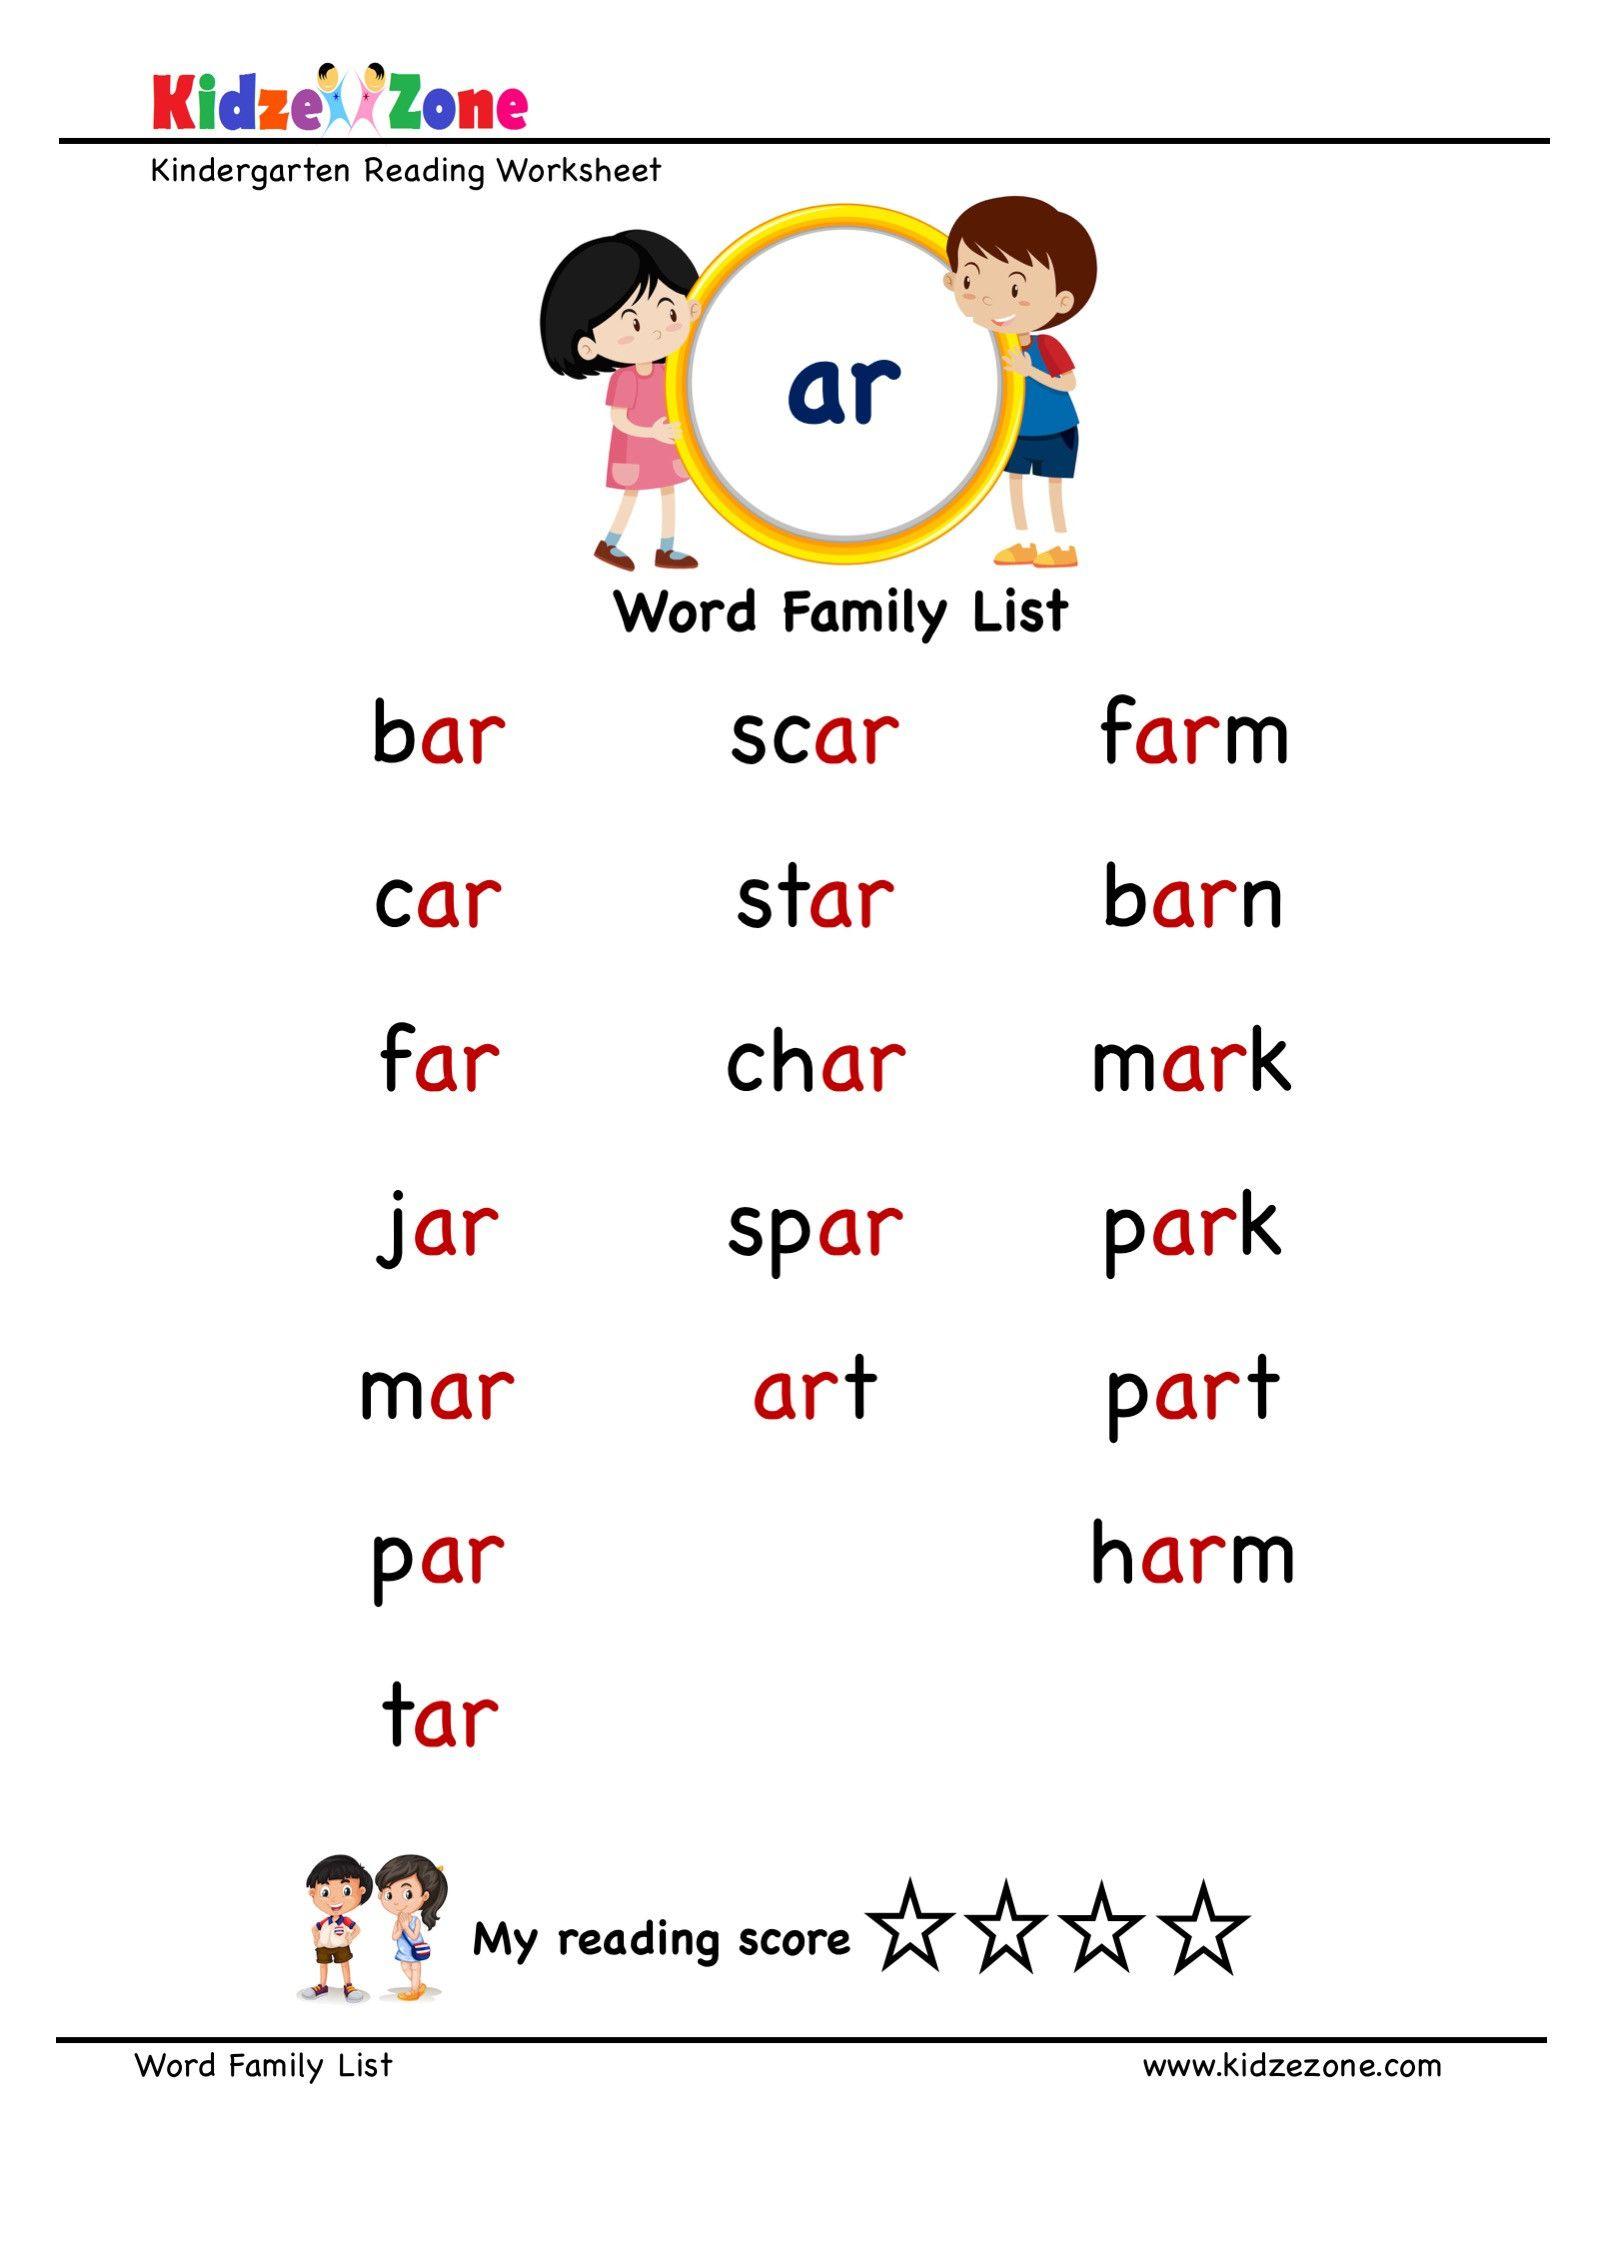 At Family Worksheets For Kindergarten In 2020 Word Family Worksheets Word Families Family Worksheet [ 2249 x 1606 Pixel ]